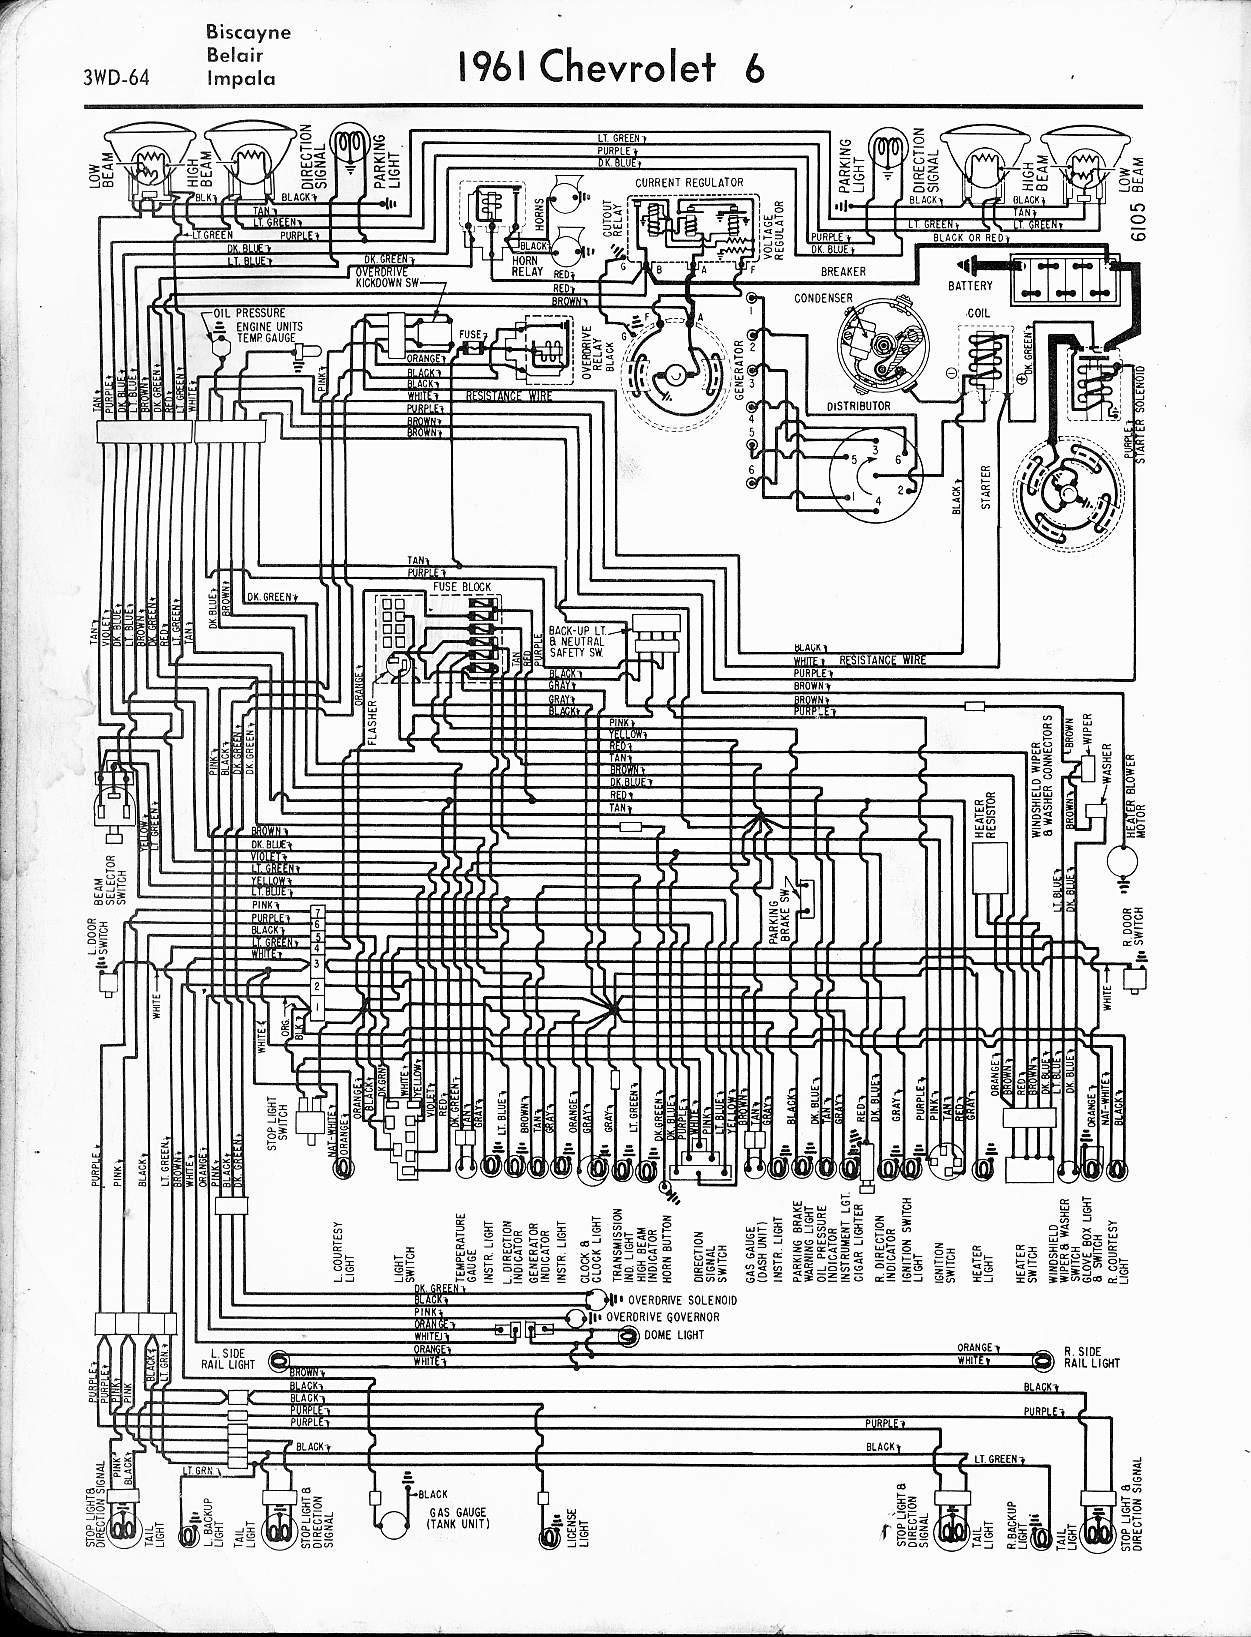 2001 Impala Wiring Schematic,Wiring.Free Download Printable Wiring ...